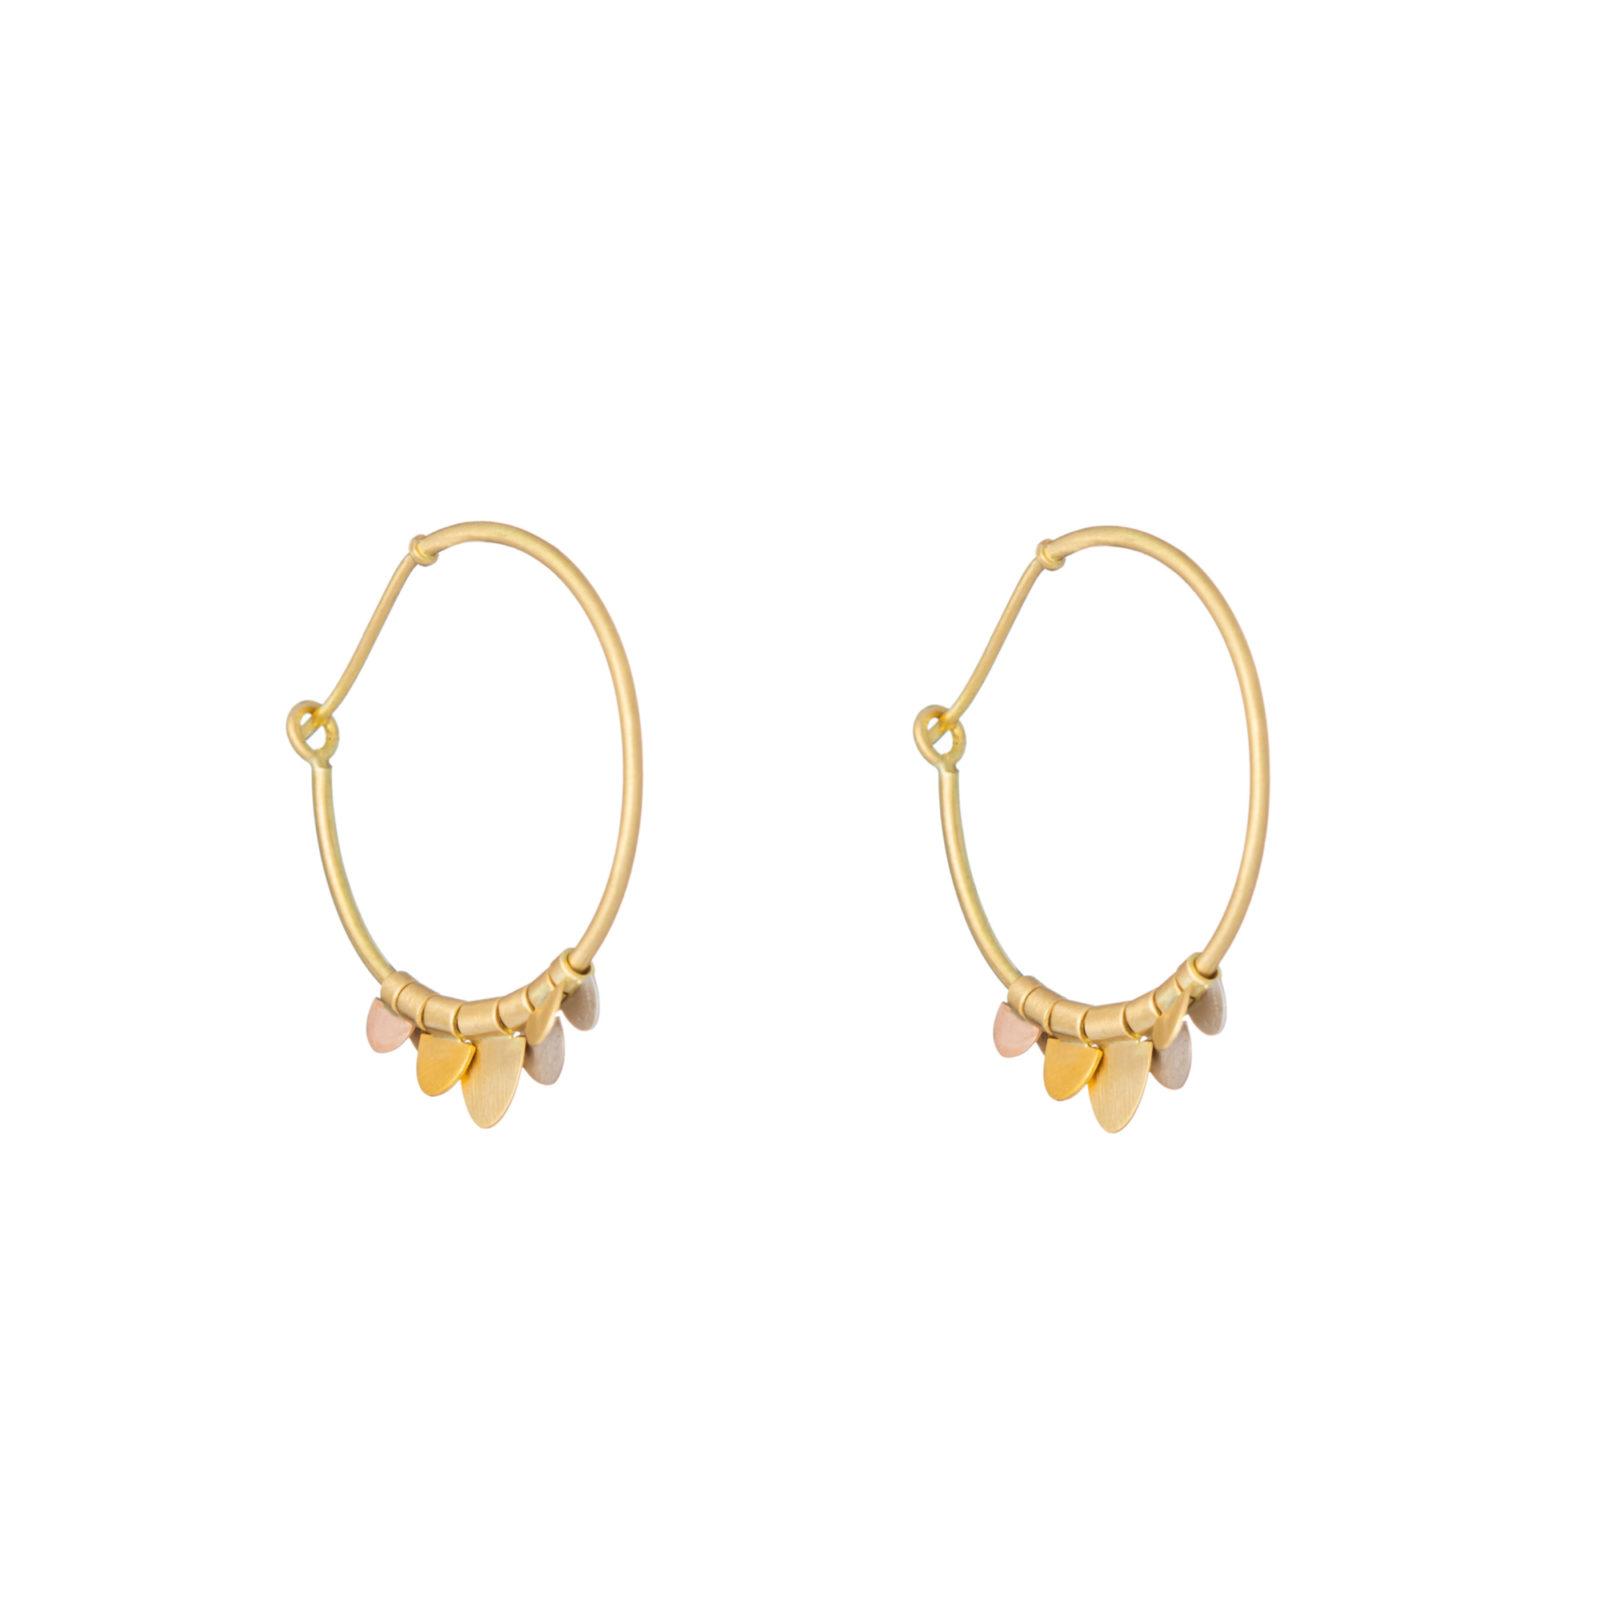 Sia Taylor FE9 RAIN Side Rainbow Gold Earrings WB